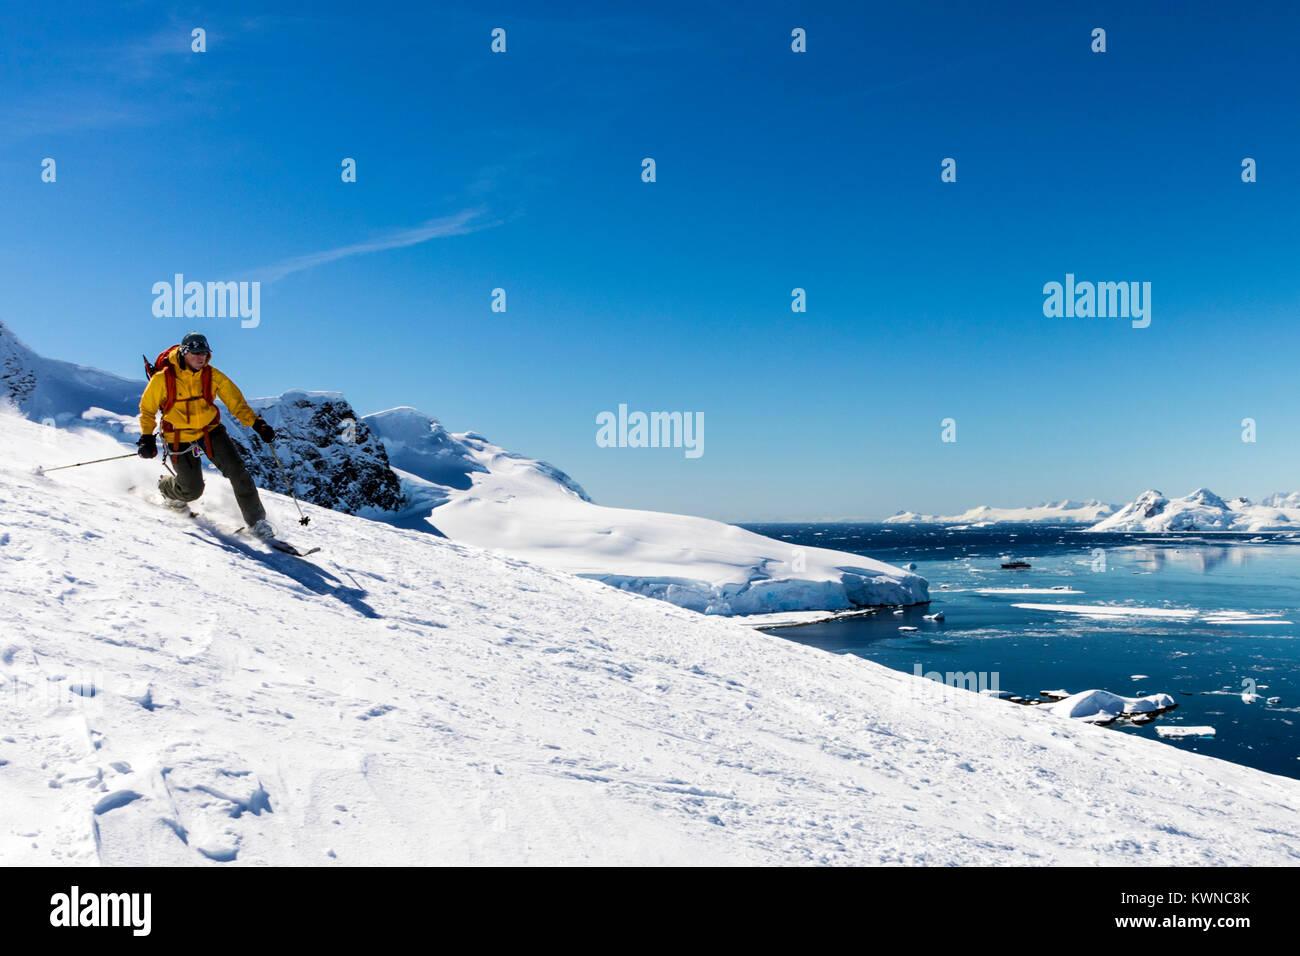 Telemark ski mountaineer skiing downhill; Nansen Island; Antarctica - Stock Image